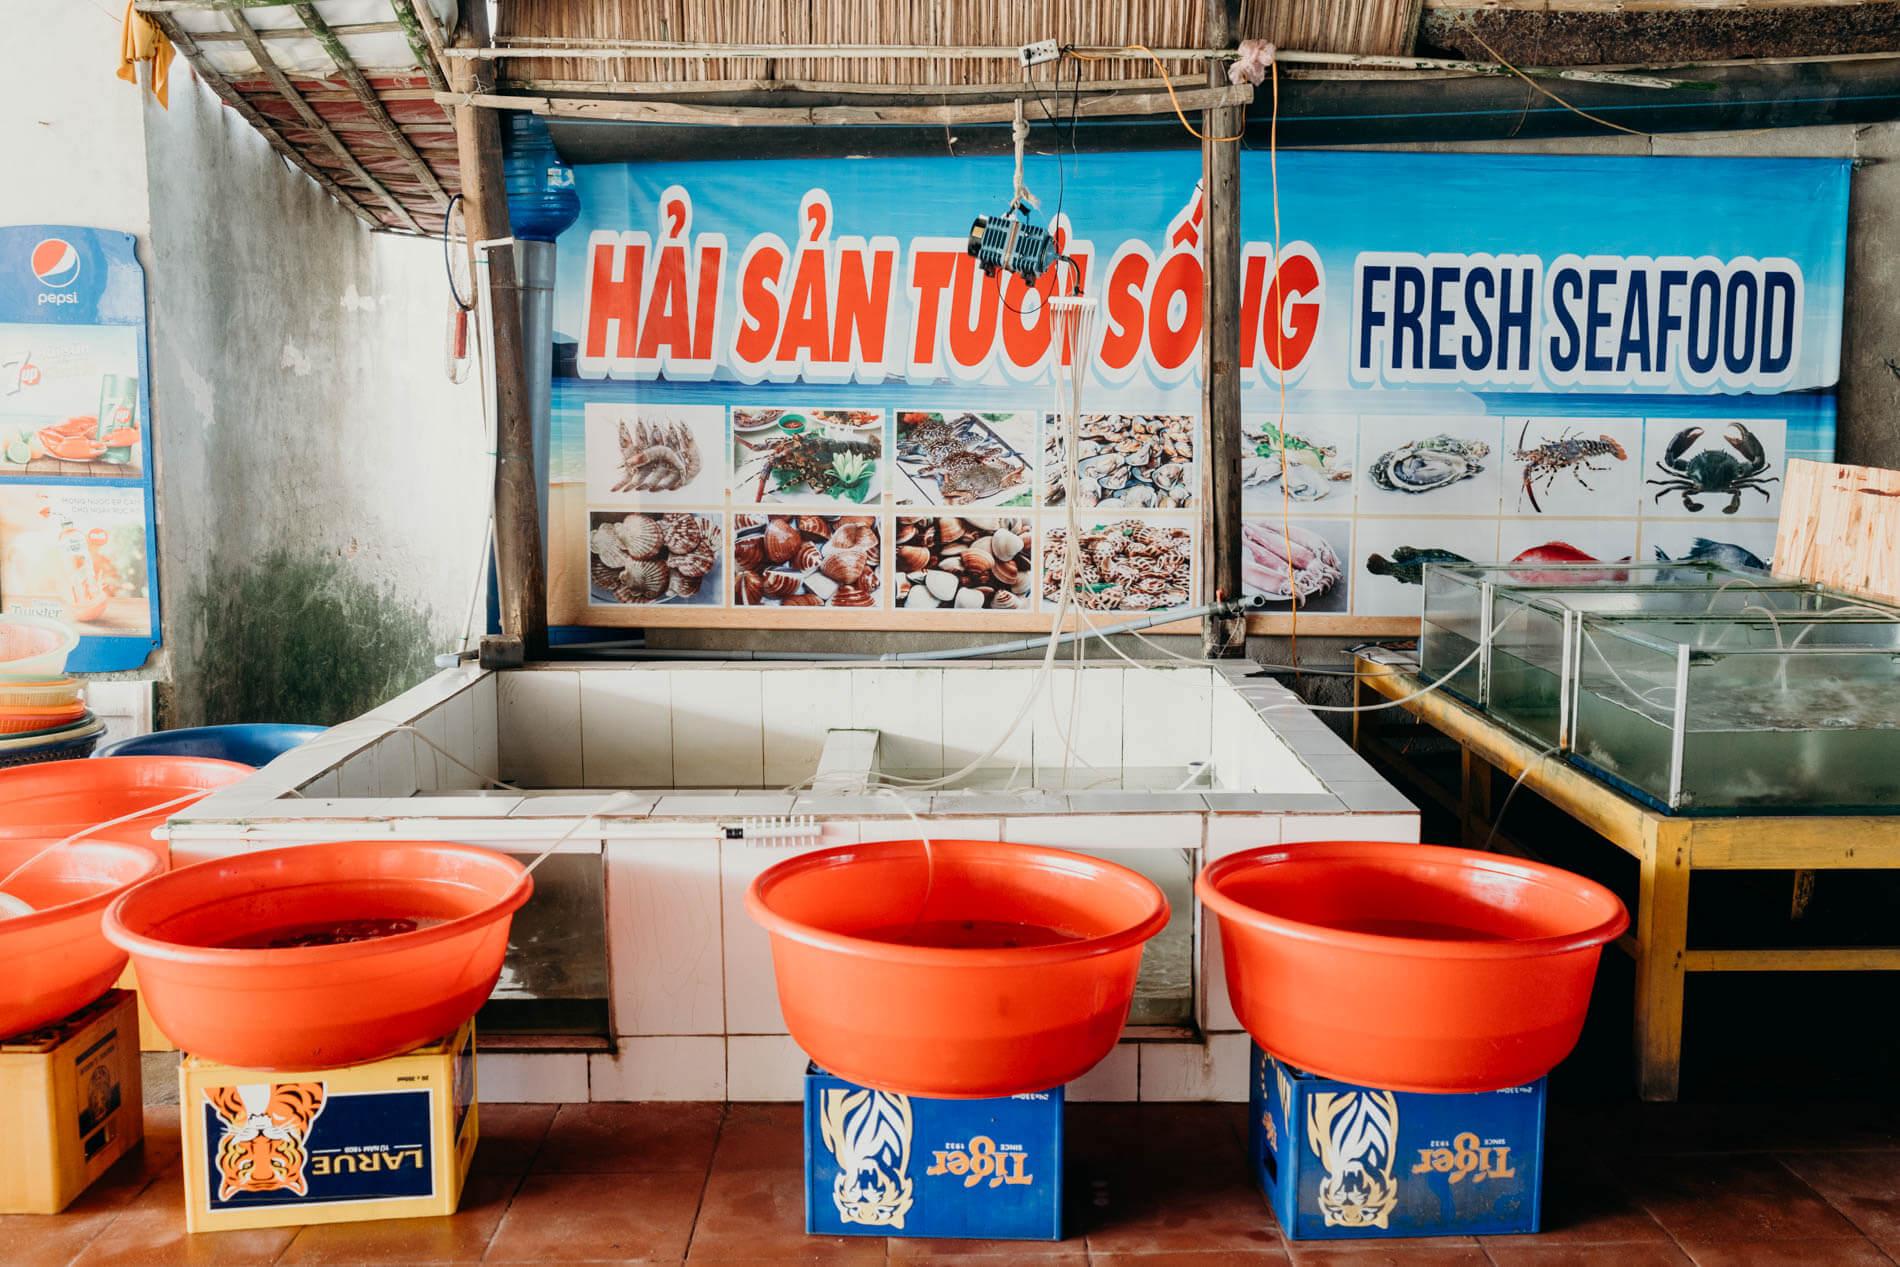 Hon Restaurant's fresh seafood